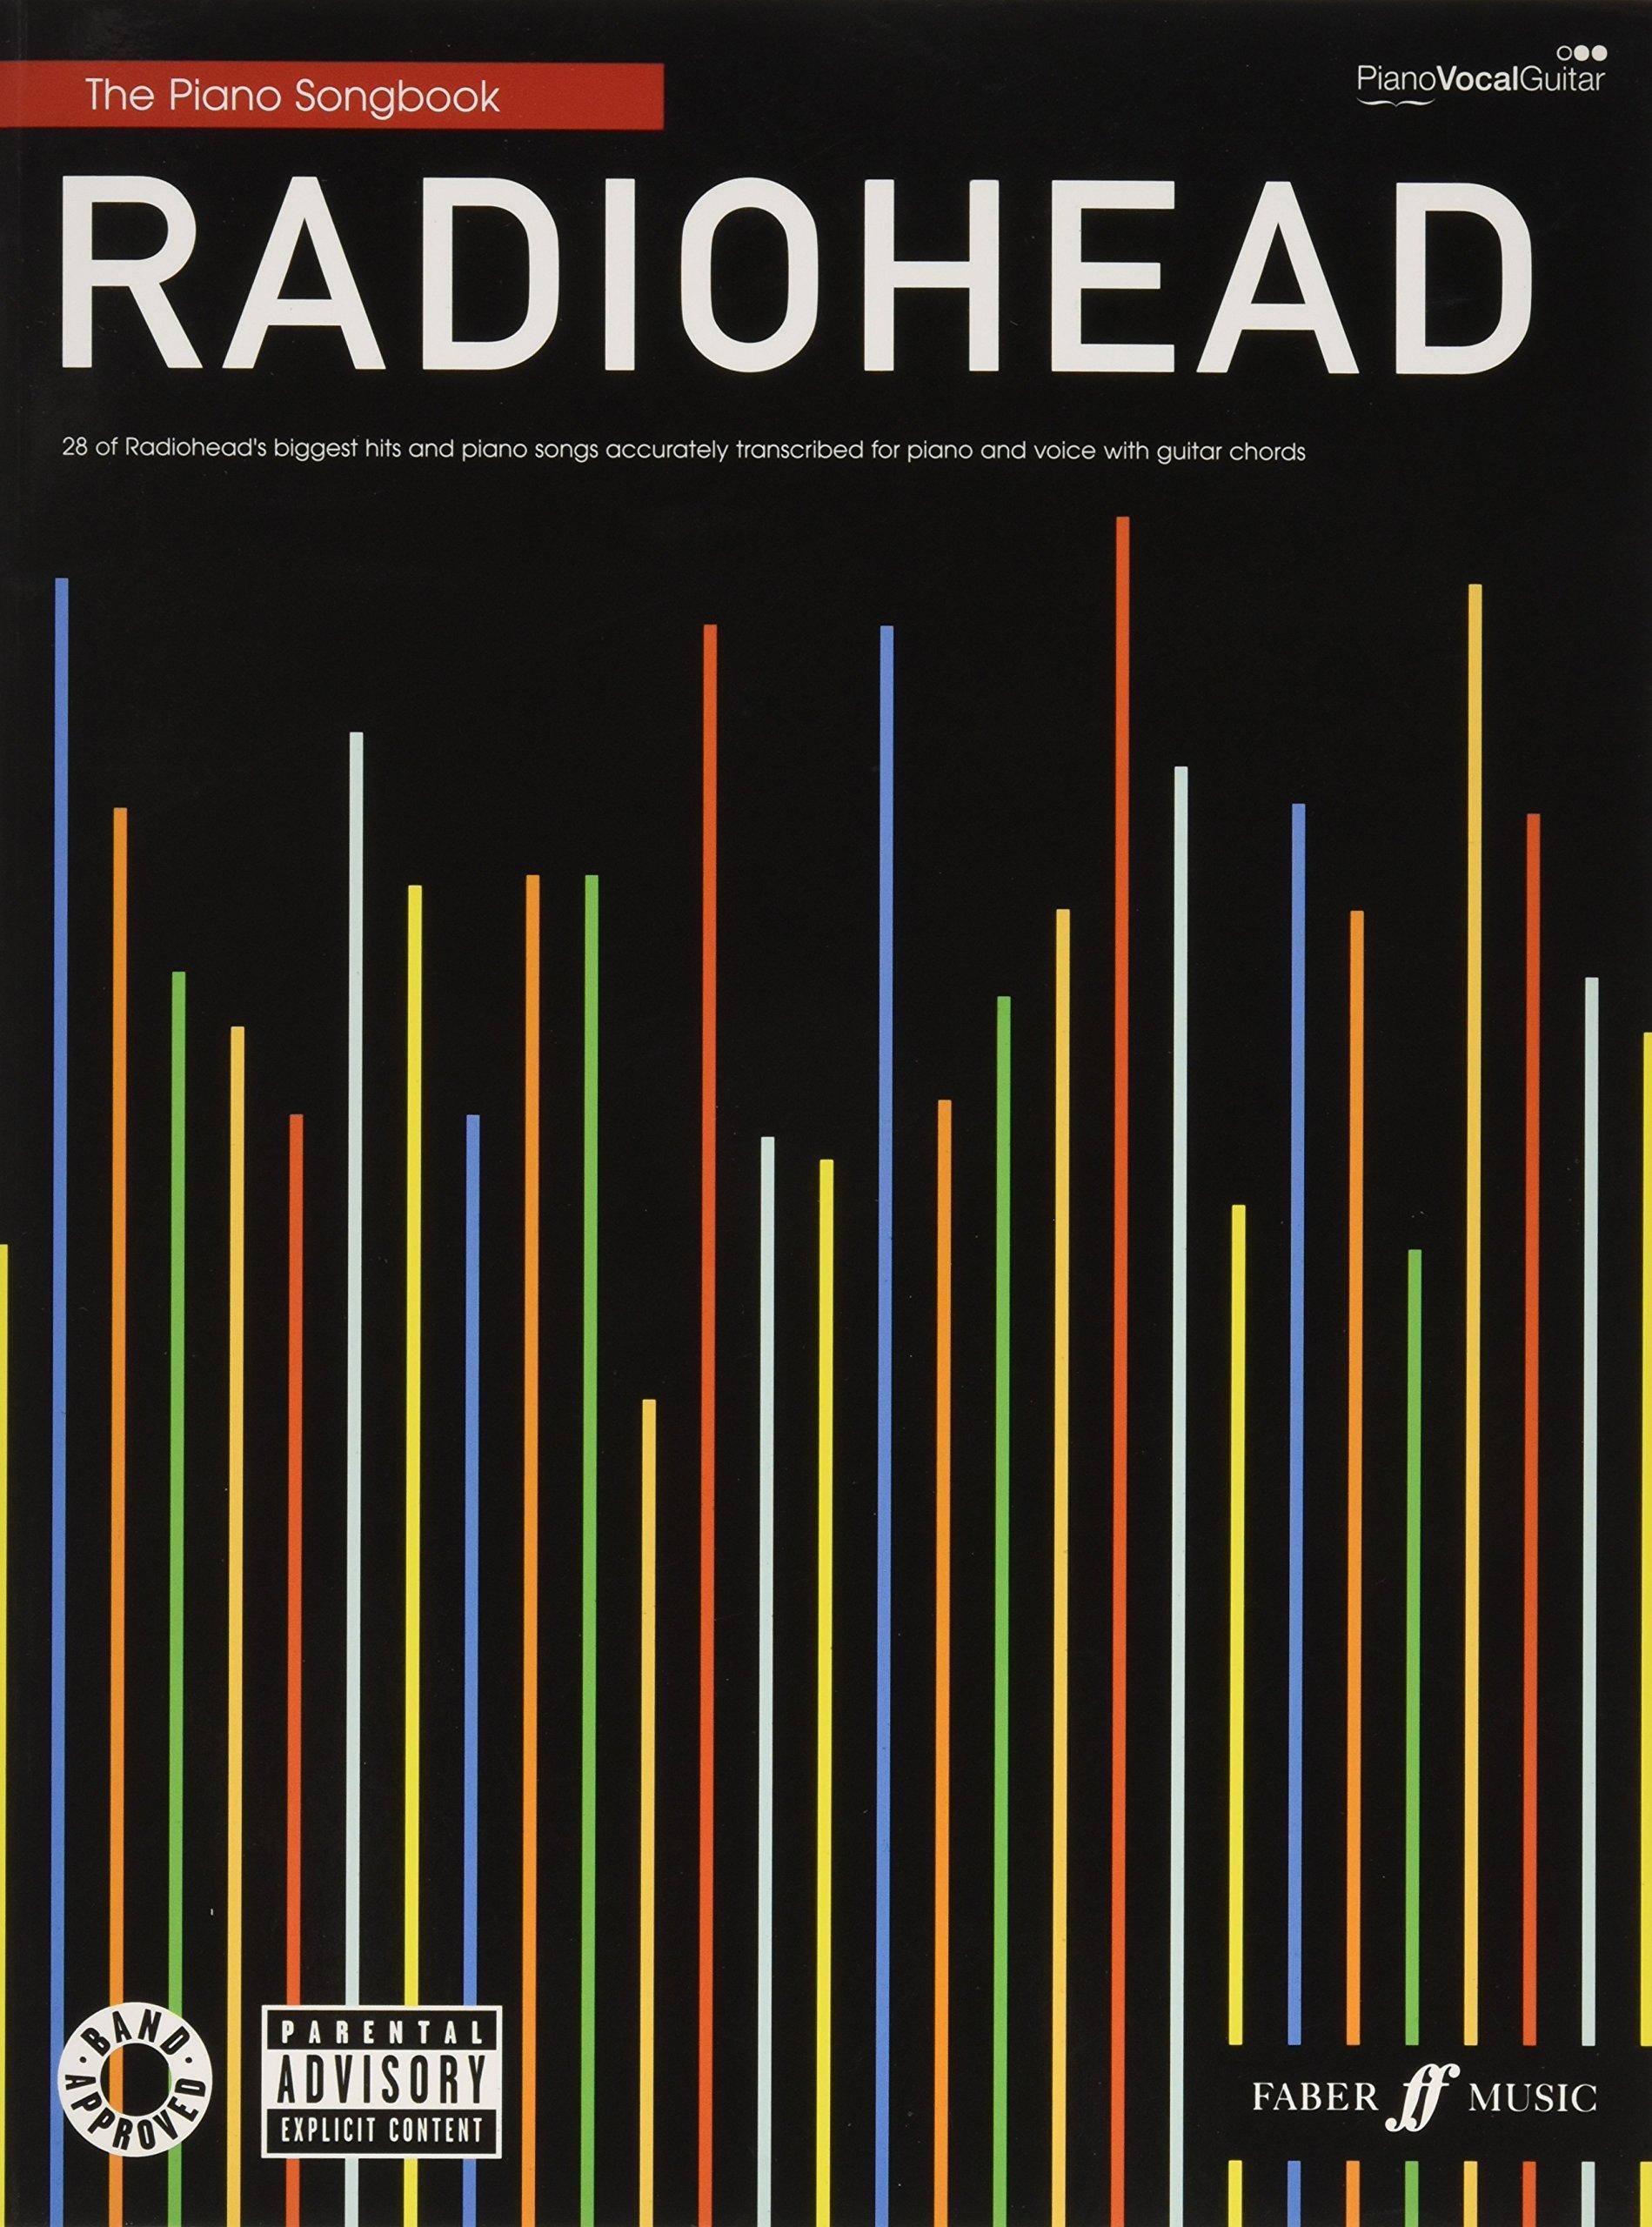 Radiohead Piano Songbook Piano Vocal Guitar Radiohead